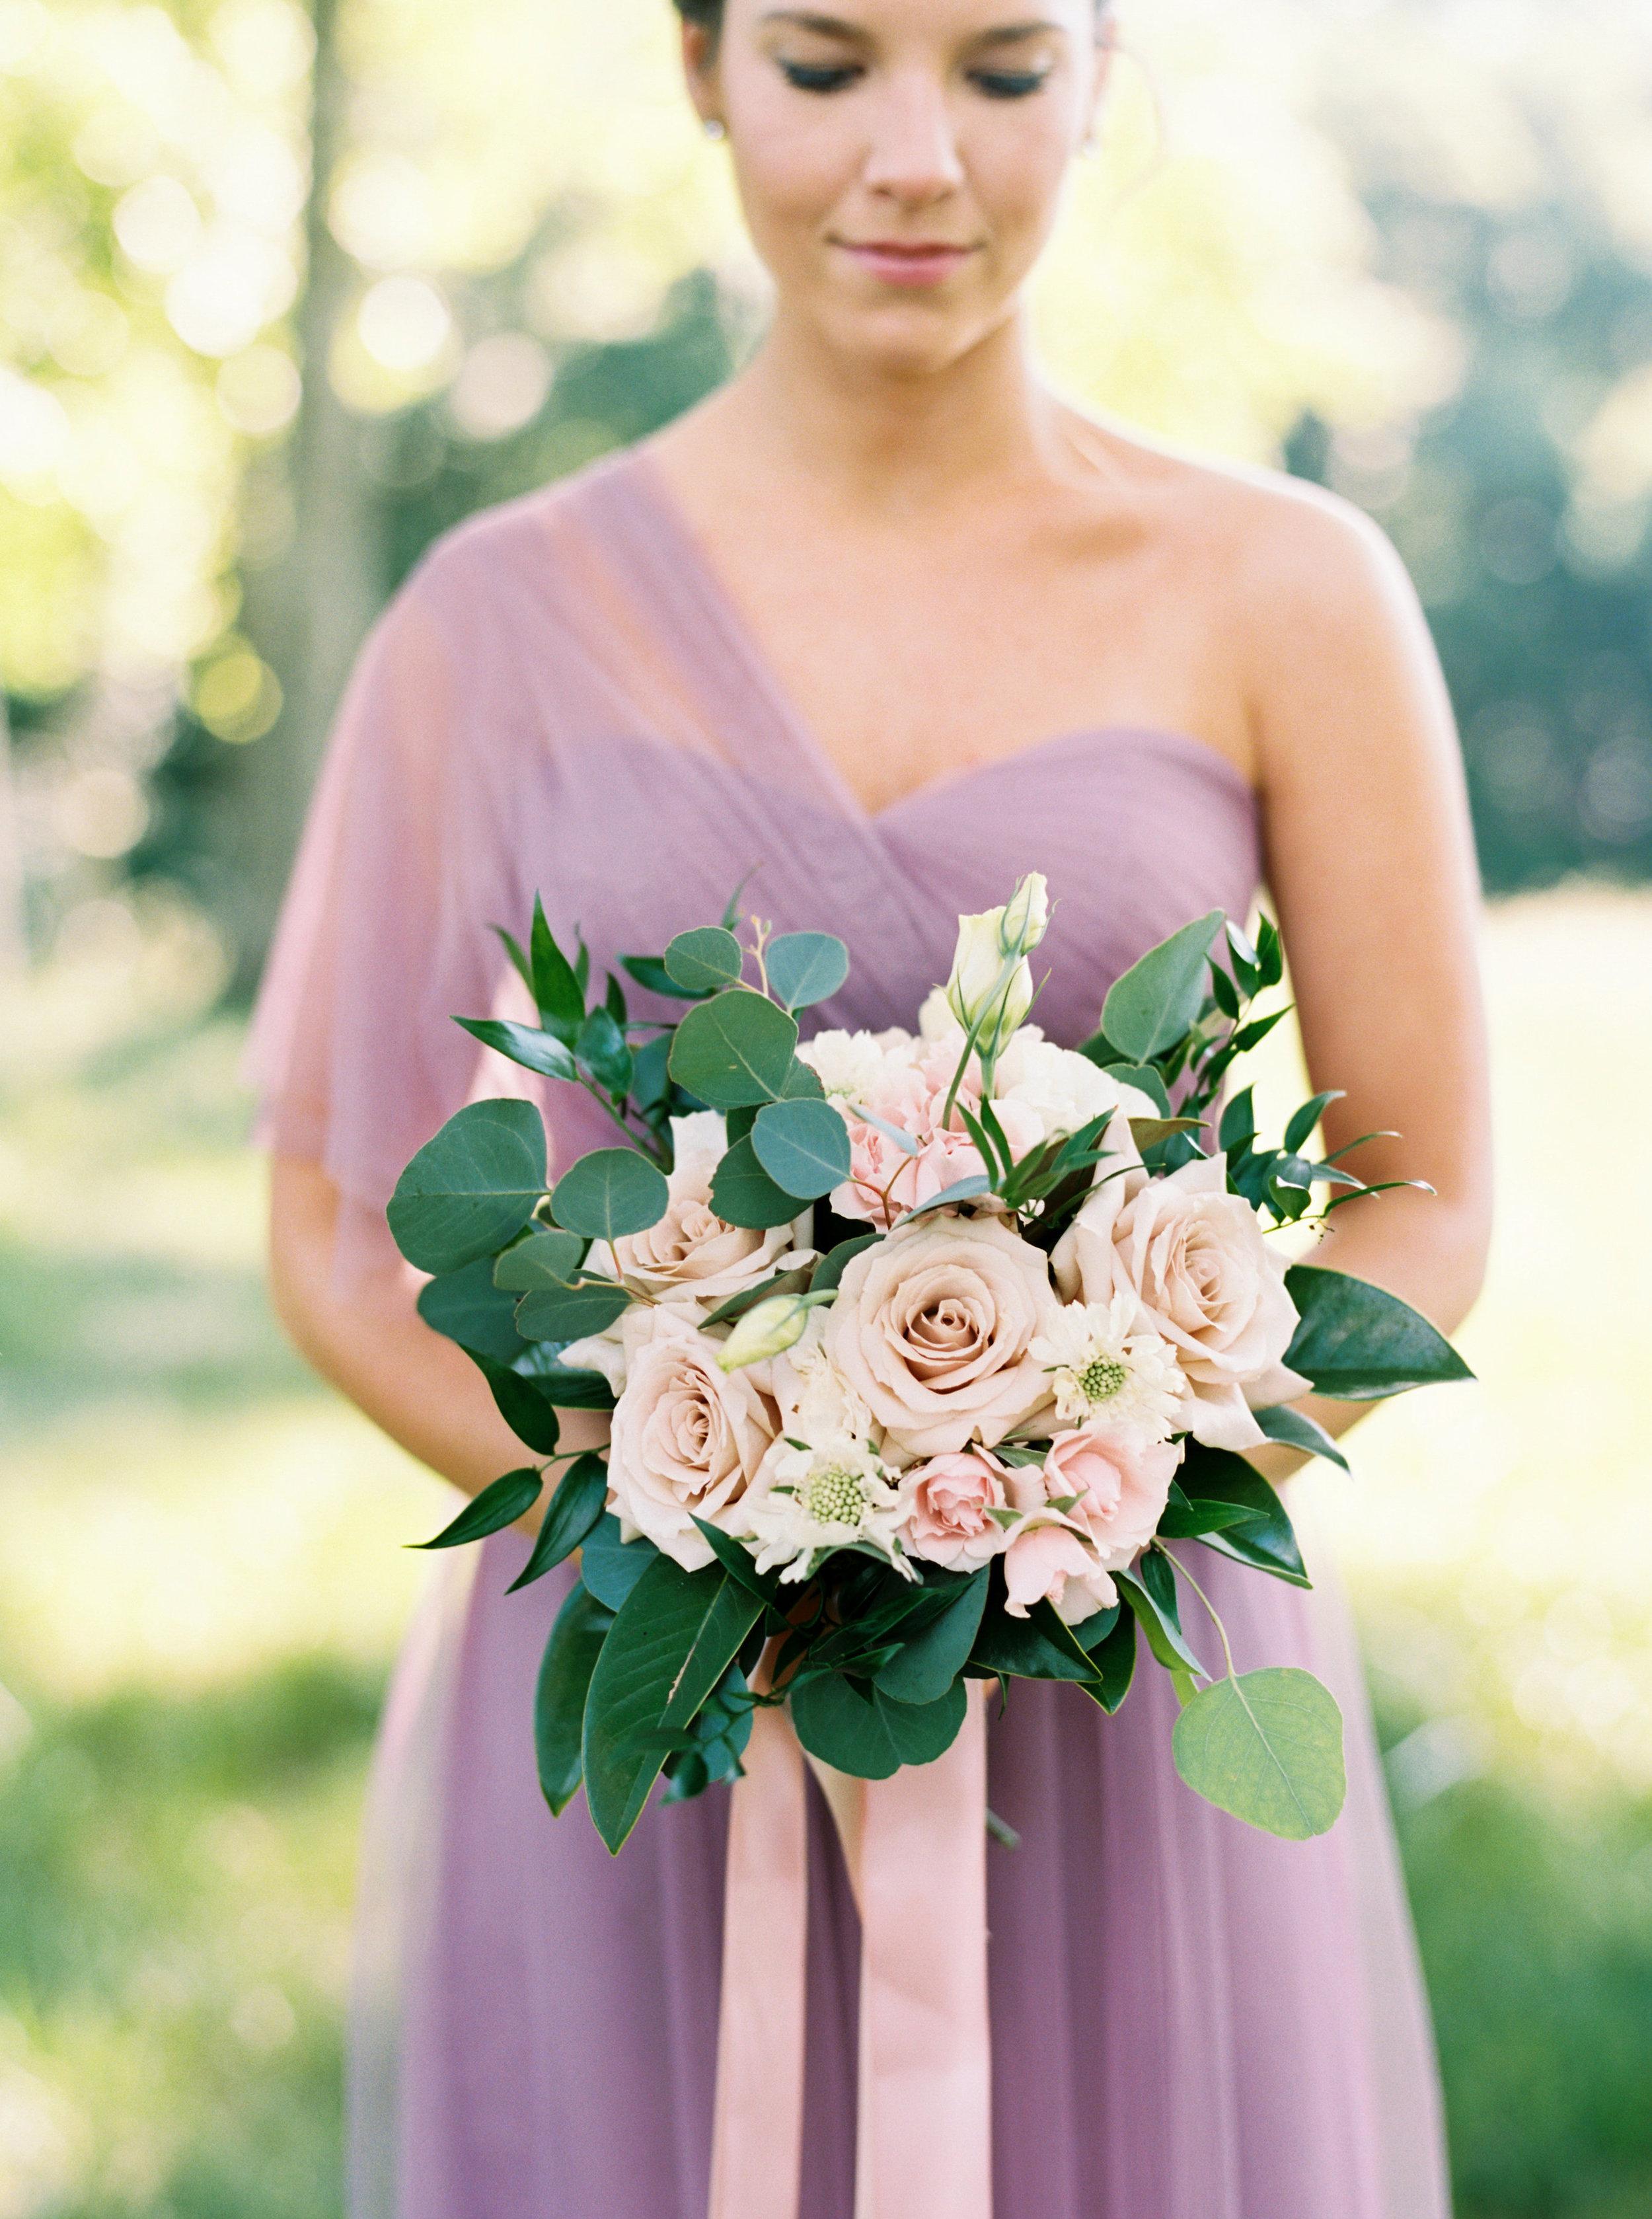 Bridesmaid Bouquet with Magnolia and Quicksand Roses